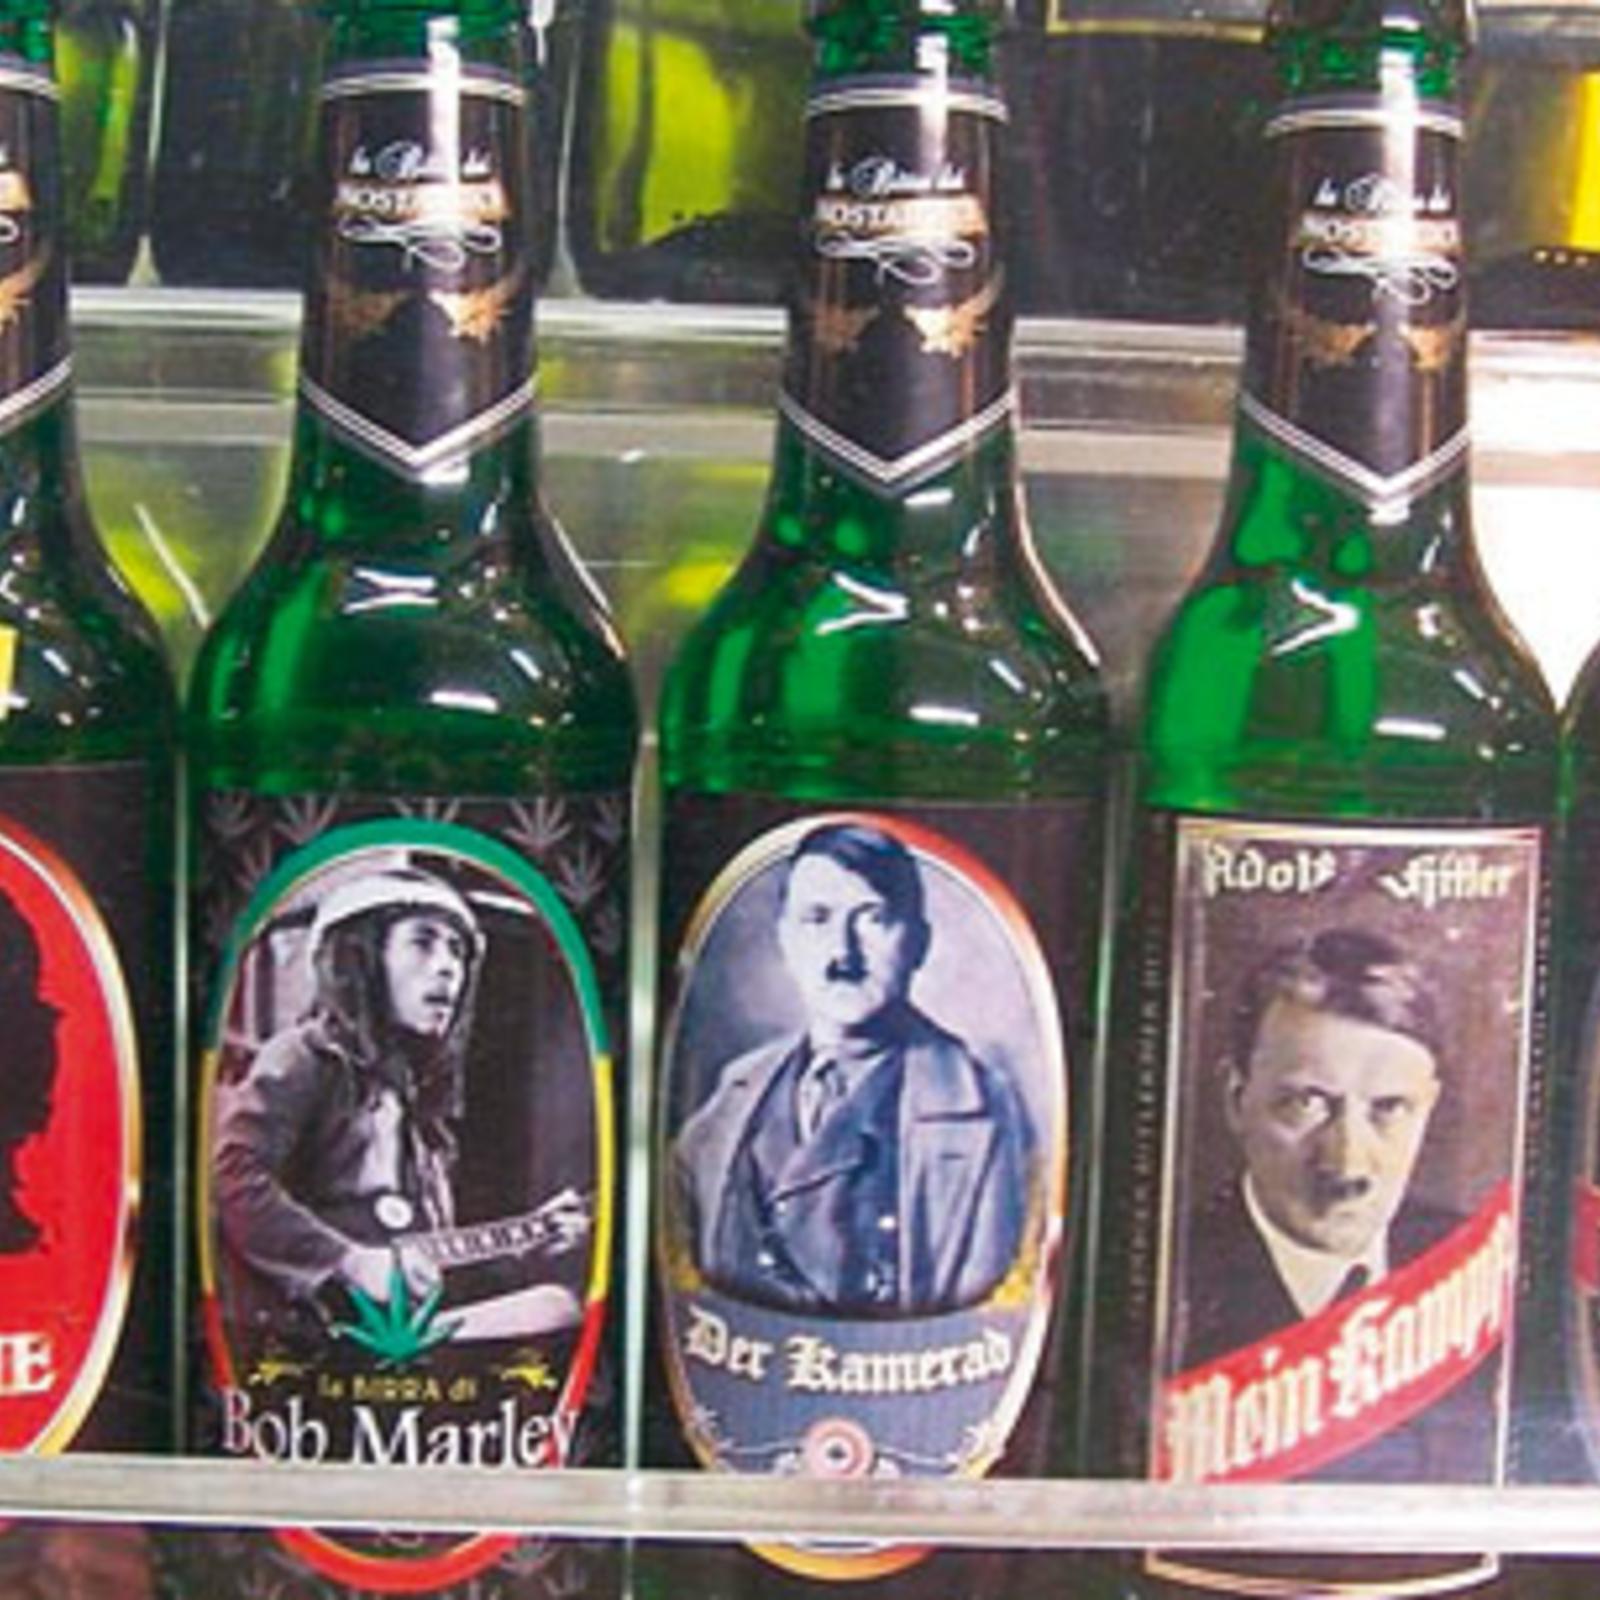 Bier hitler The Hitler